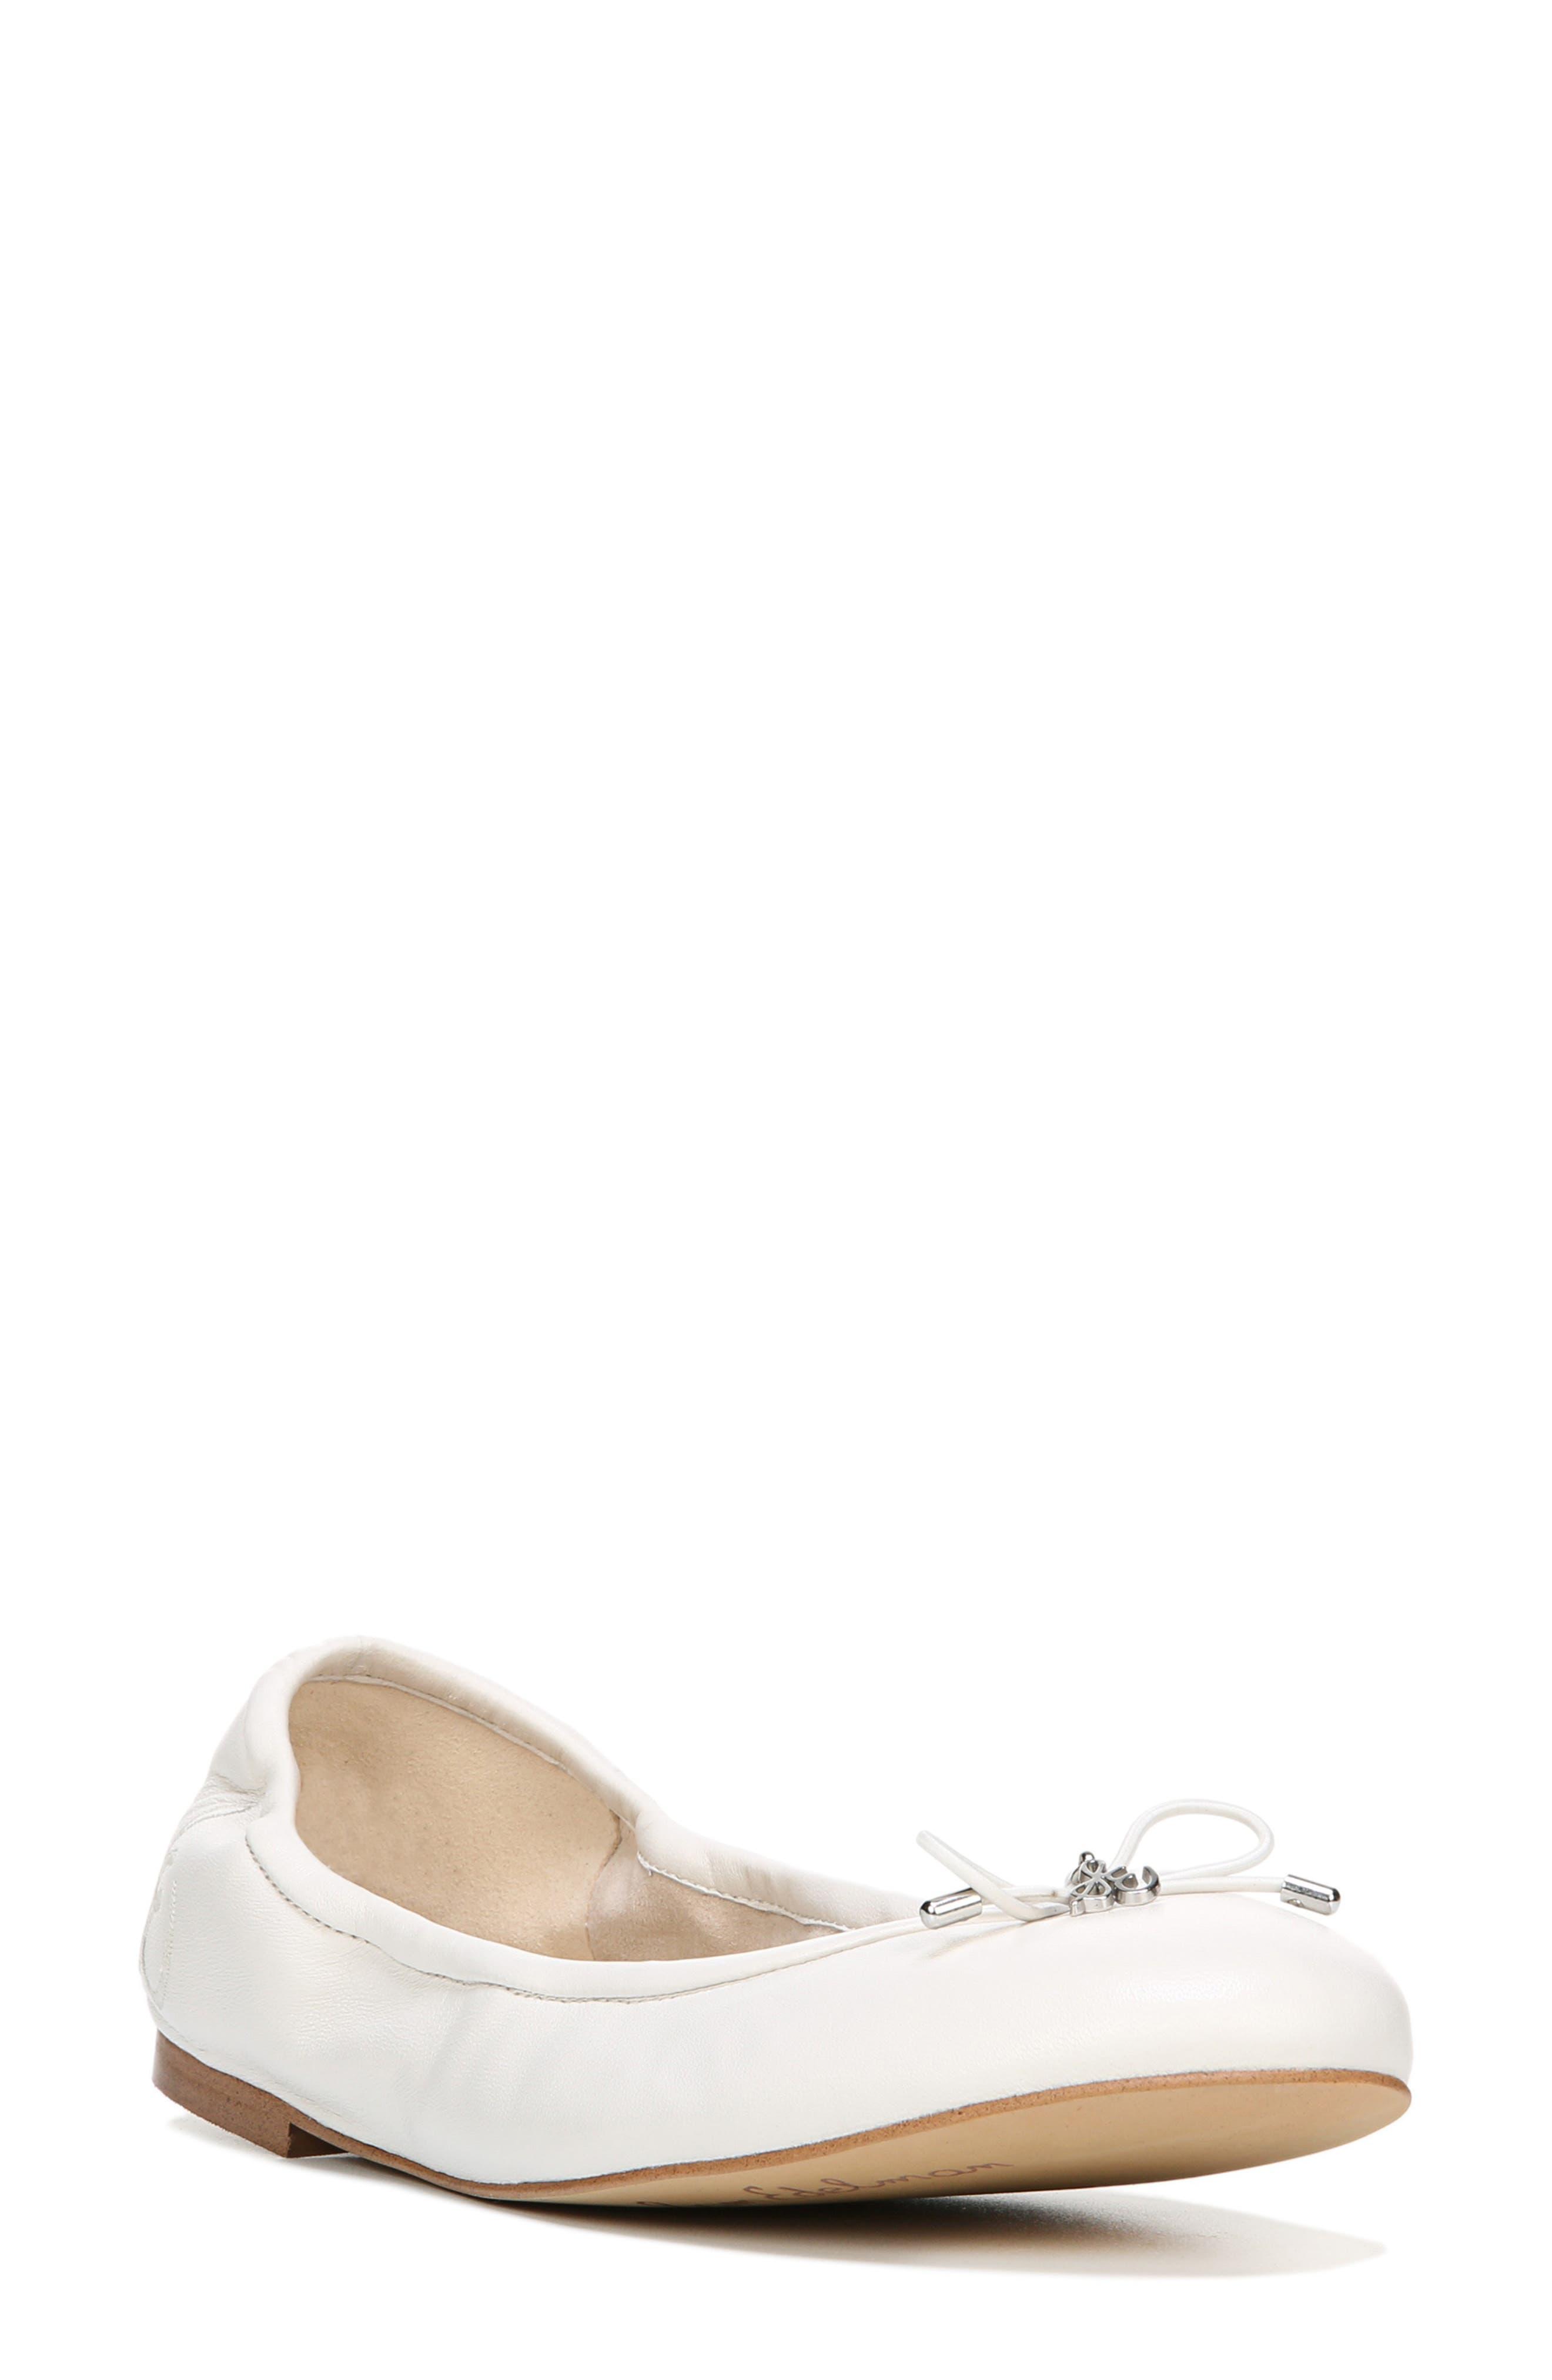 c89f2debbf99 Women s Narrow Shoes